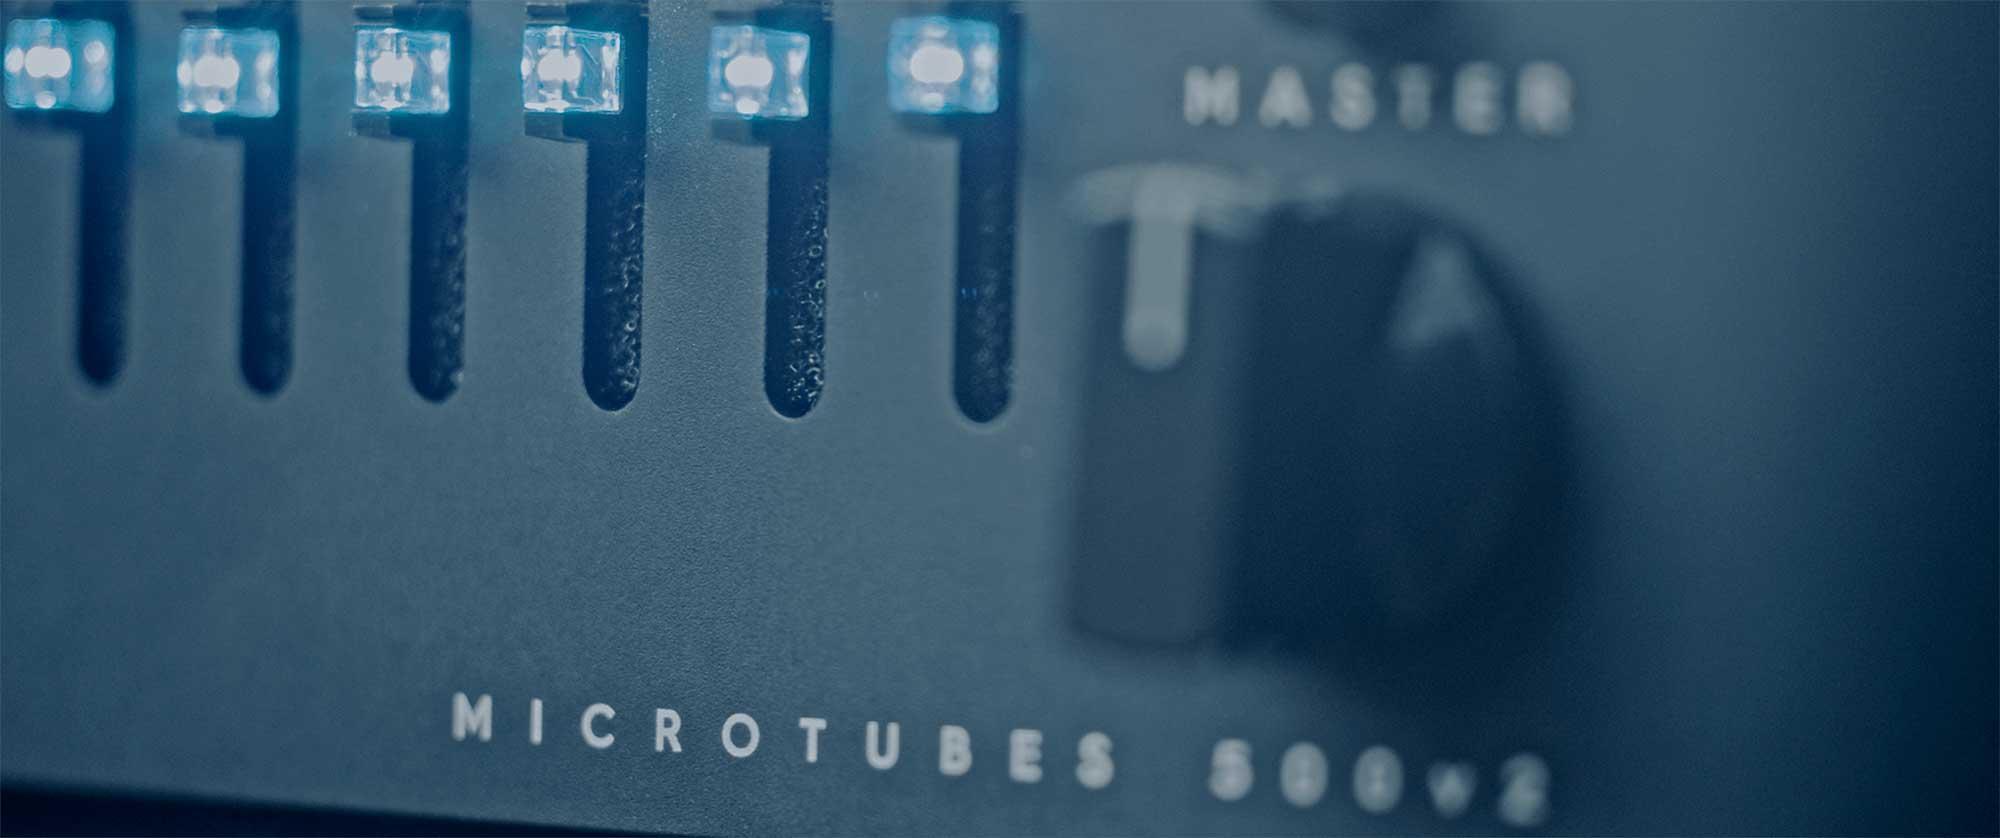 מגבר ראש לבס Darkglass Electronics Microtubes 500 v2